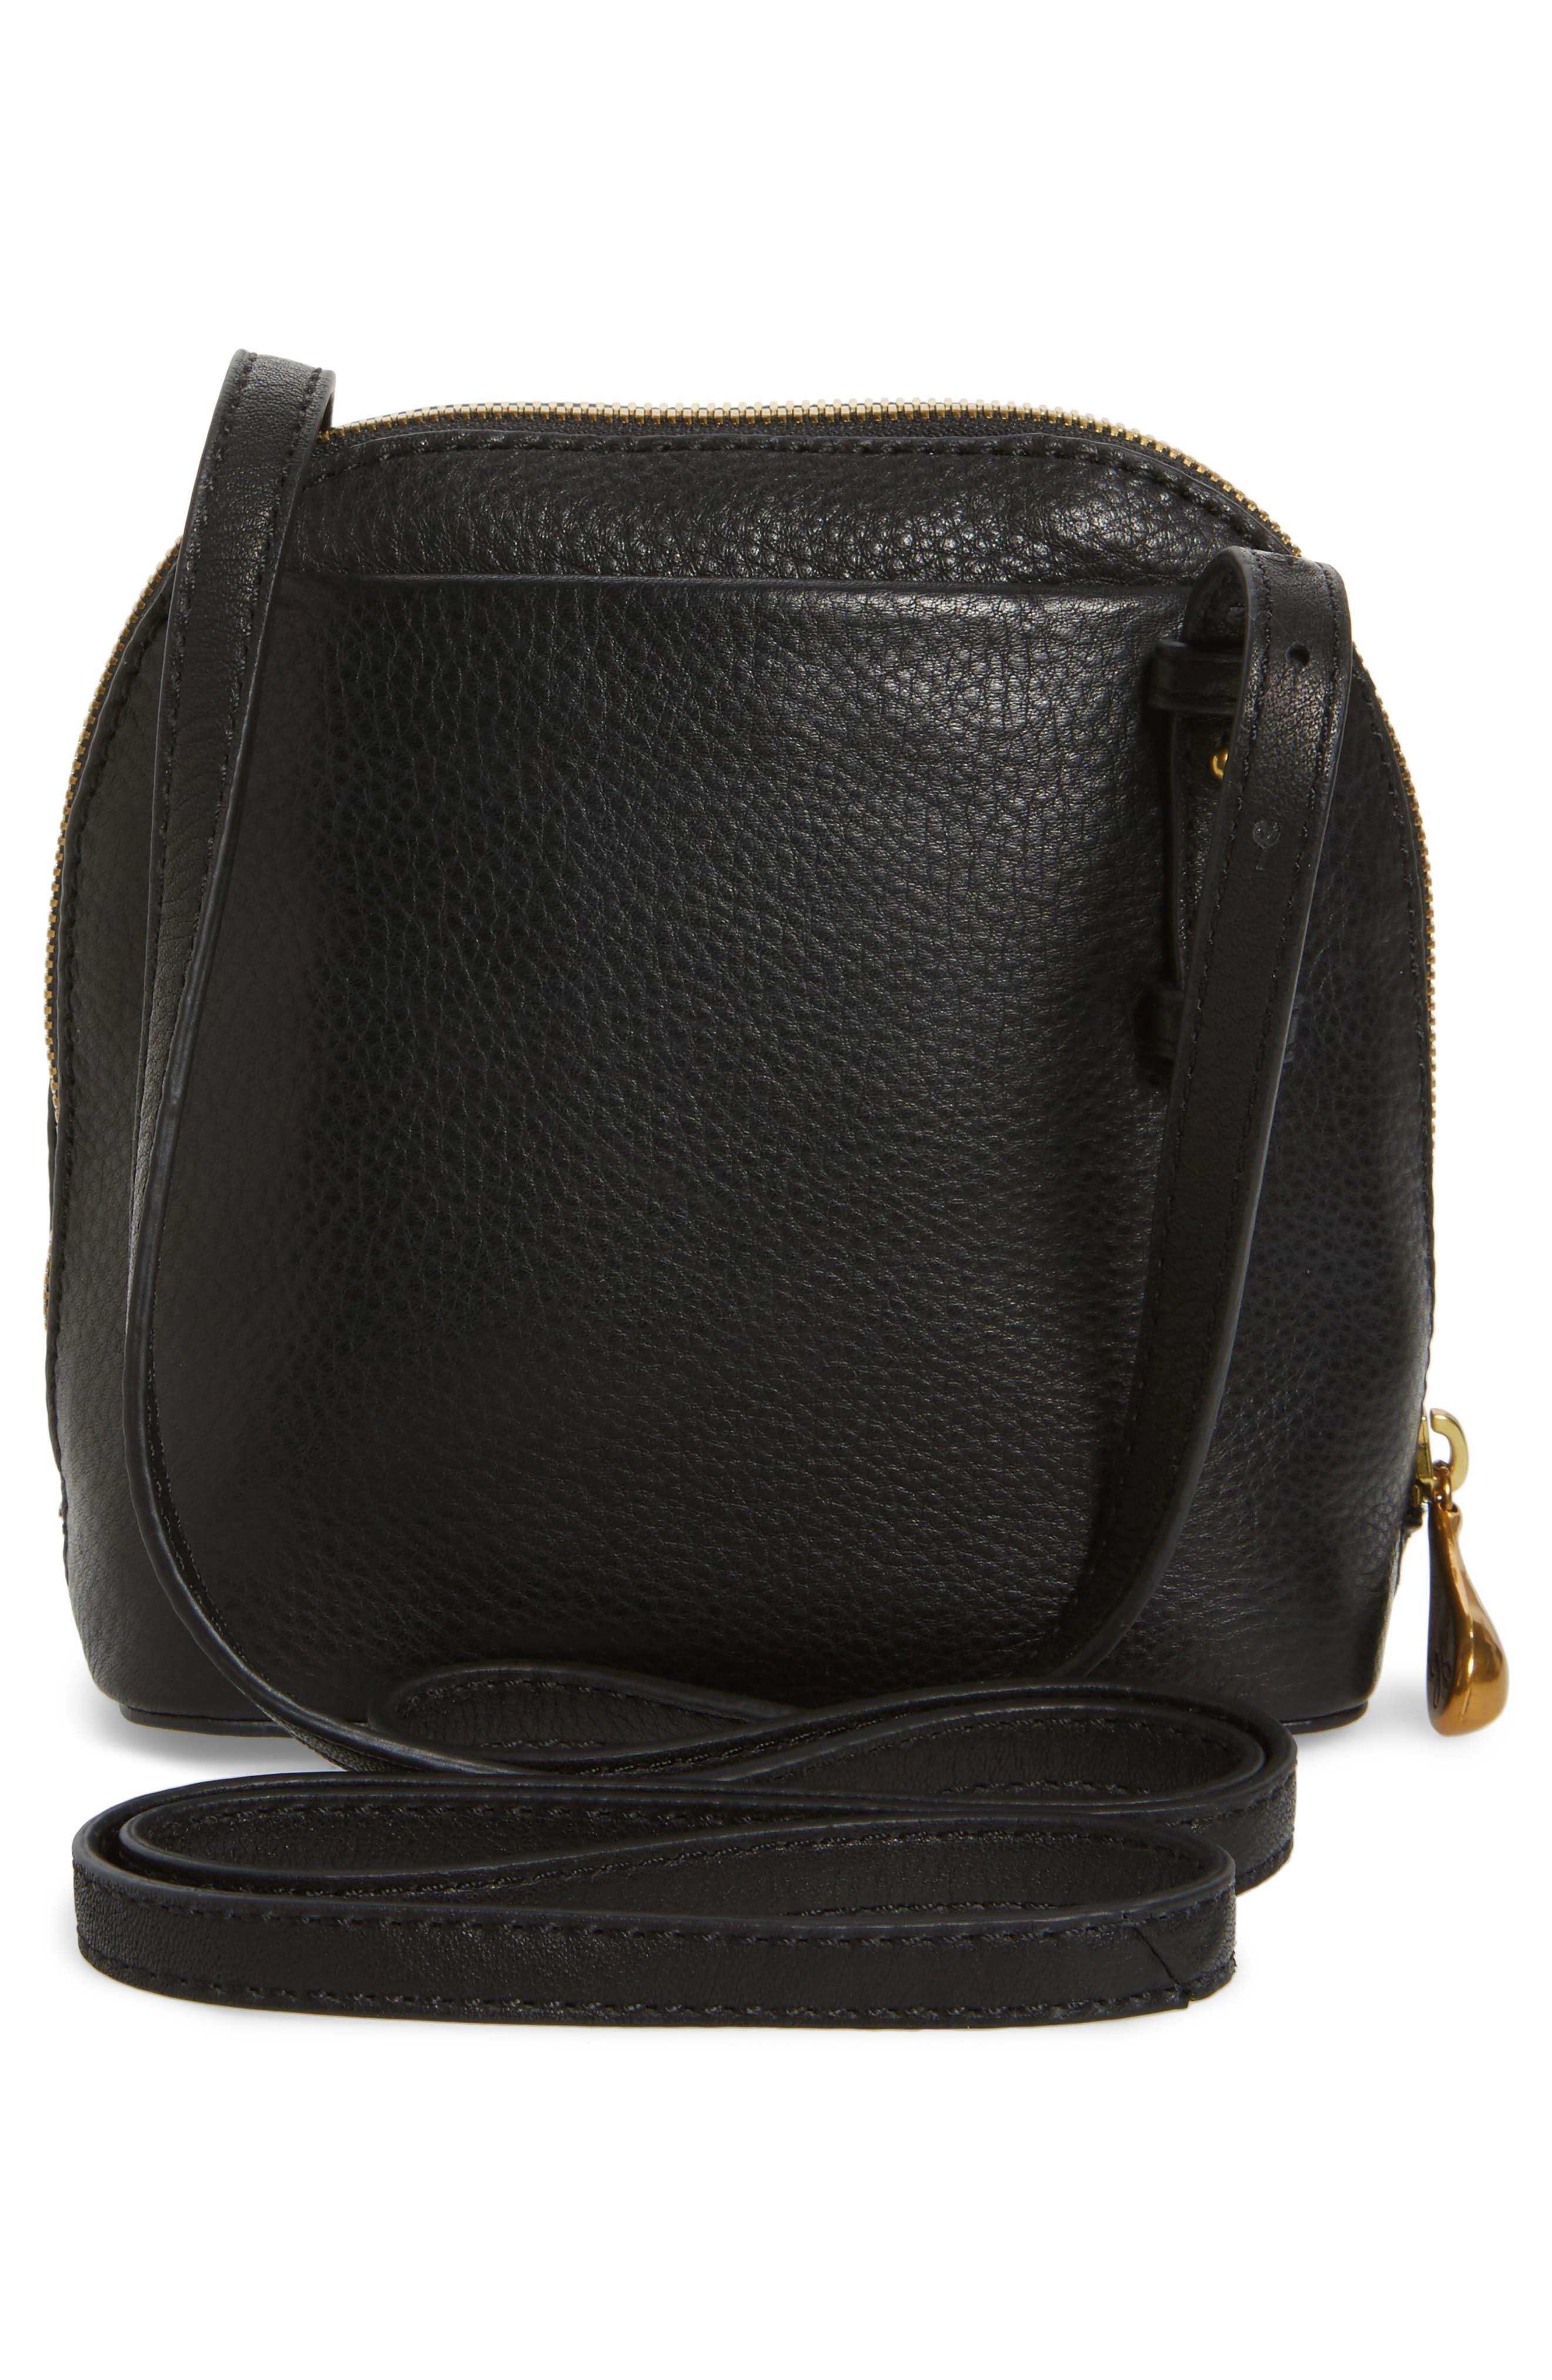 Nash Calfskin Leather Crossbody Bag,                             Alternate thumbnail 3, color,                             Black